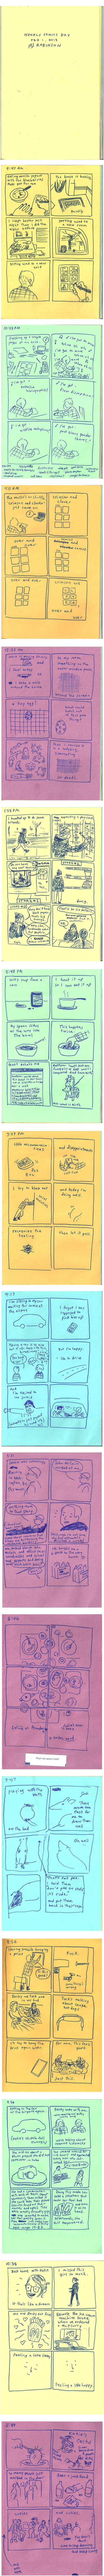 Hourly Comic Day 2013